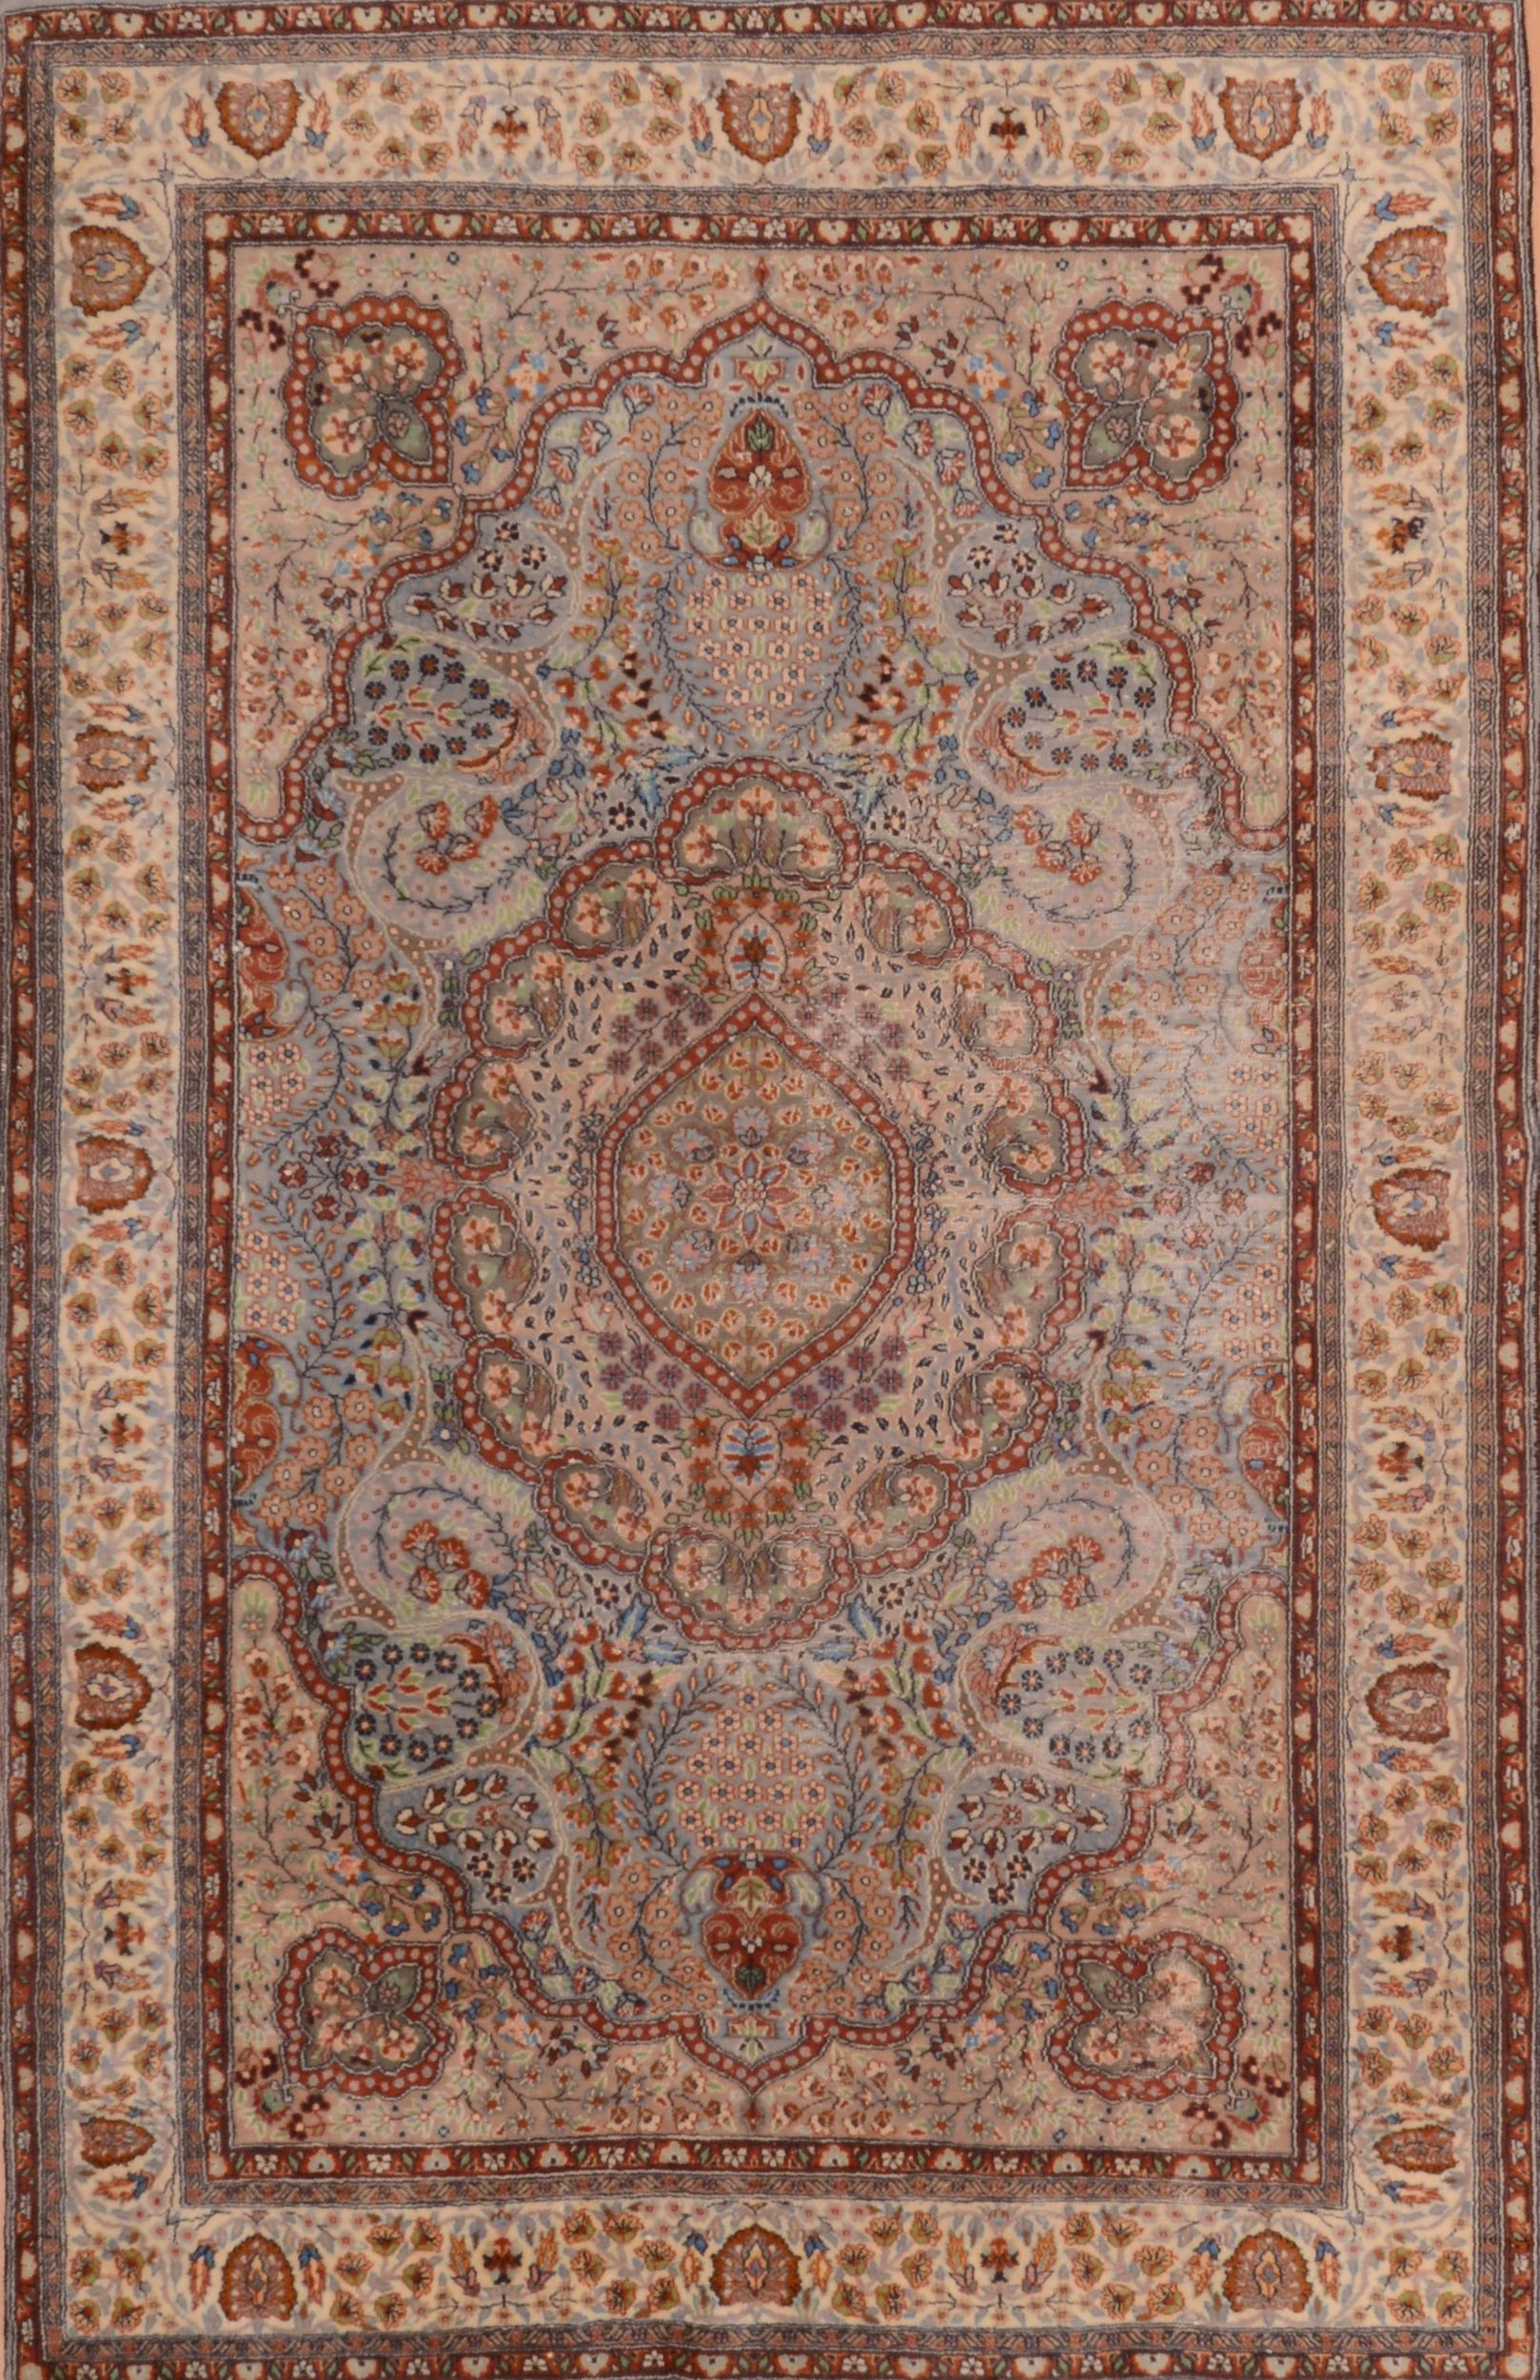 Green Rectangle 5x7 ft Wool Carpet